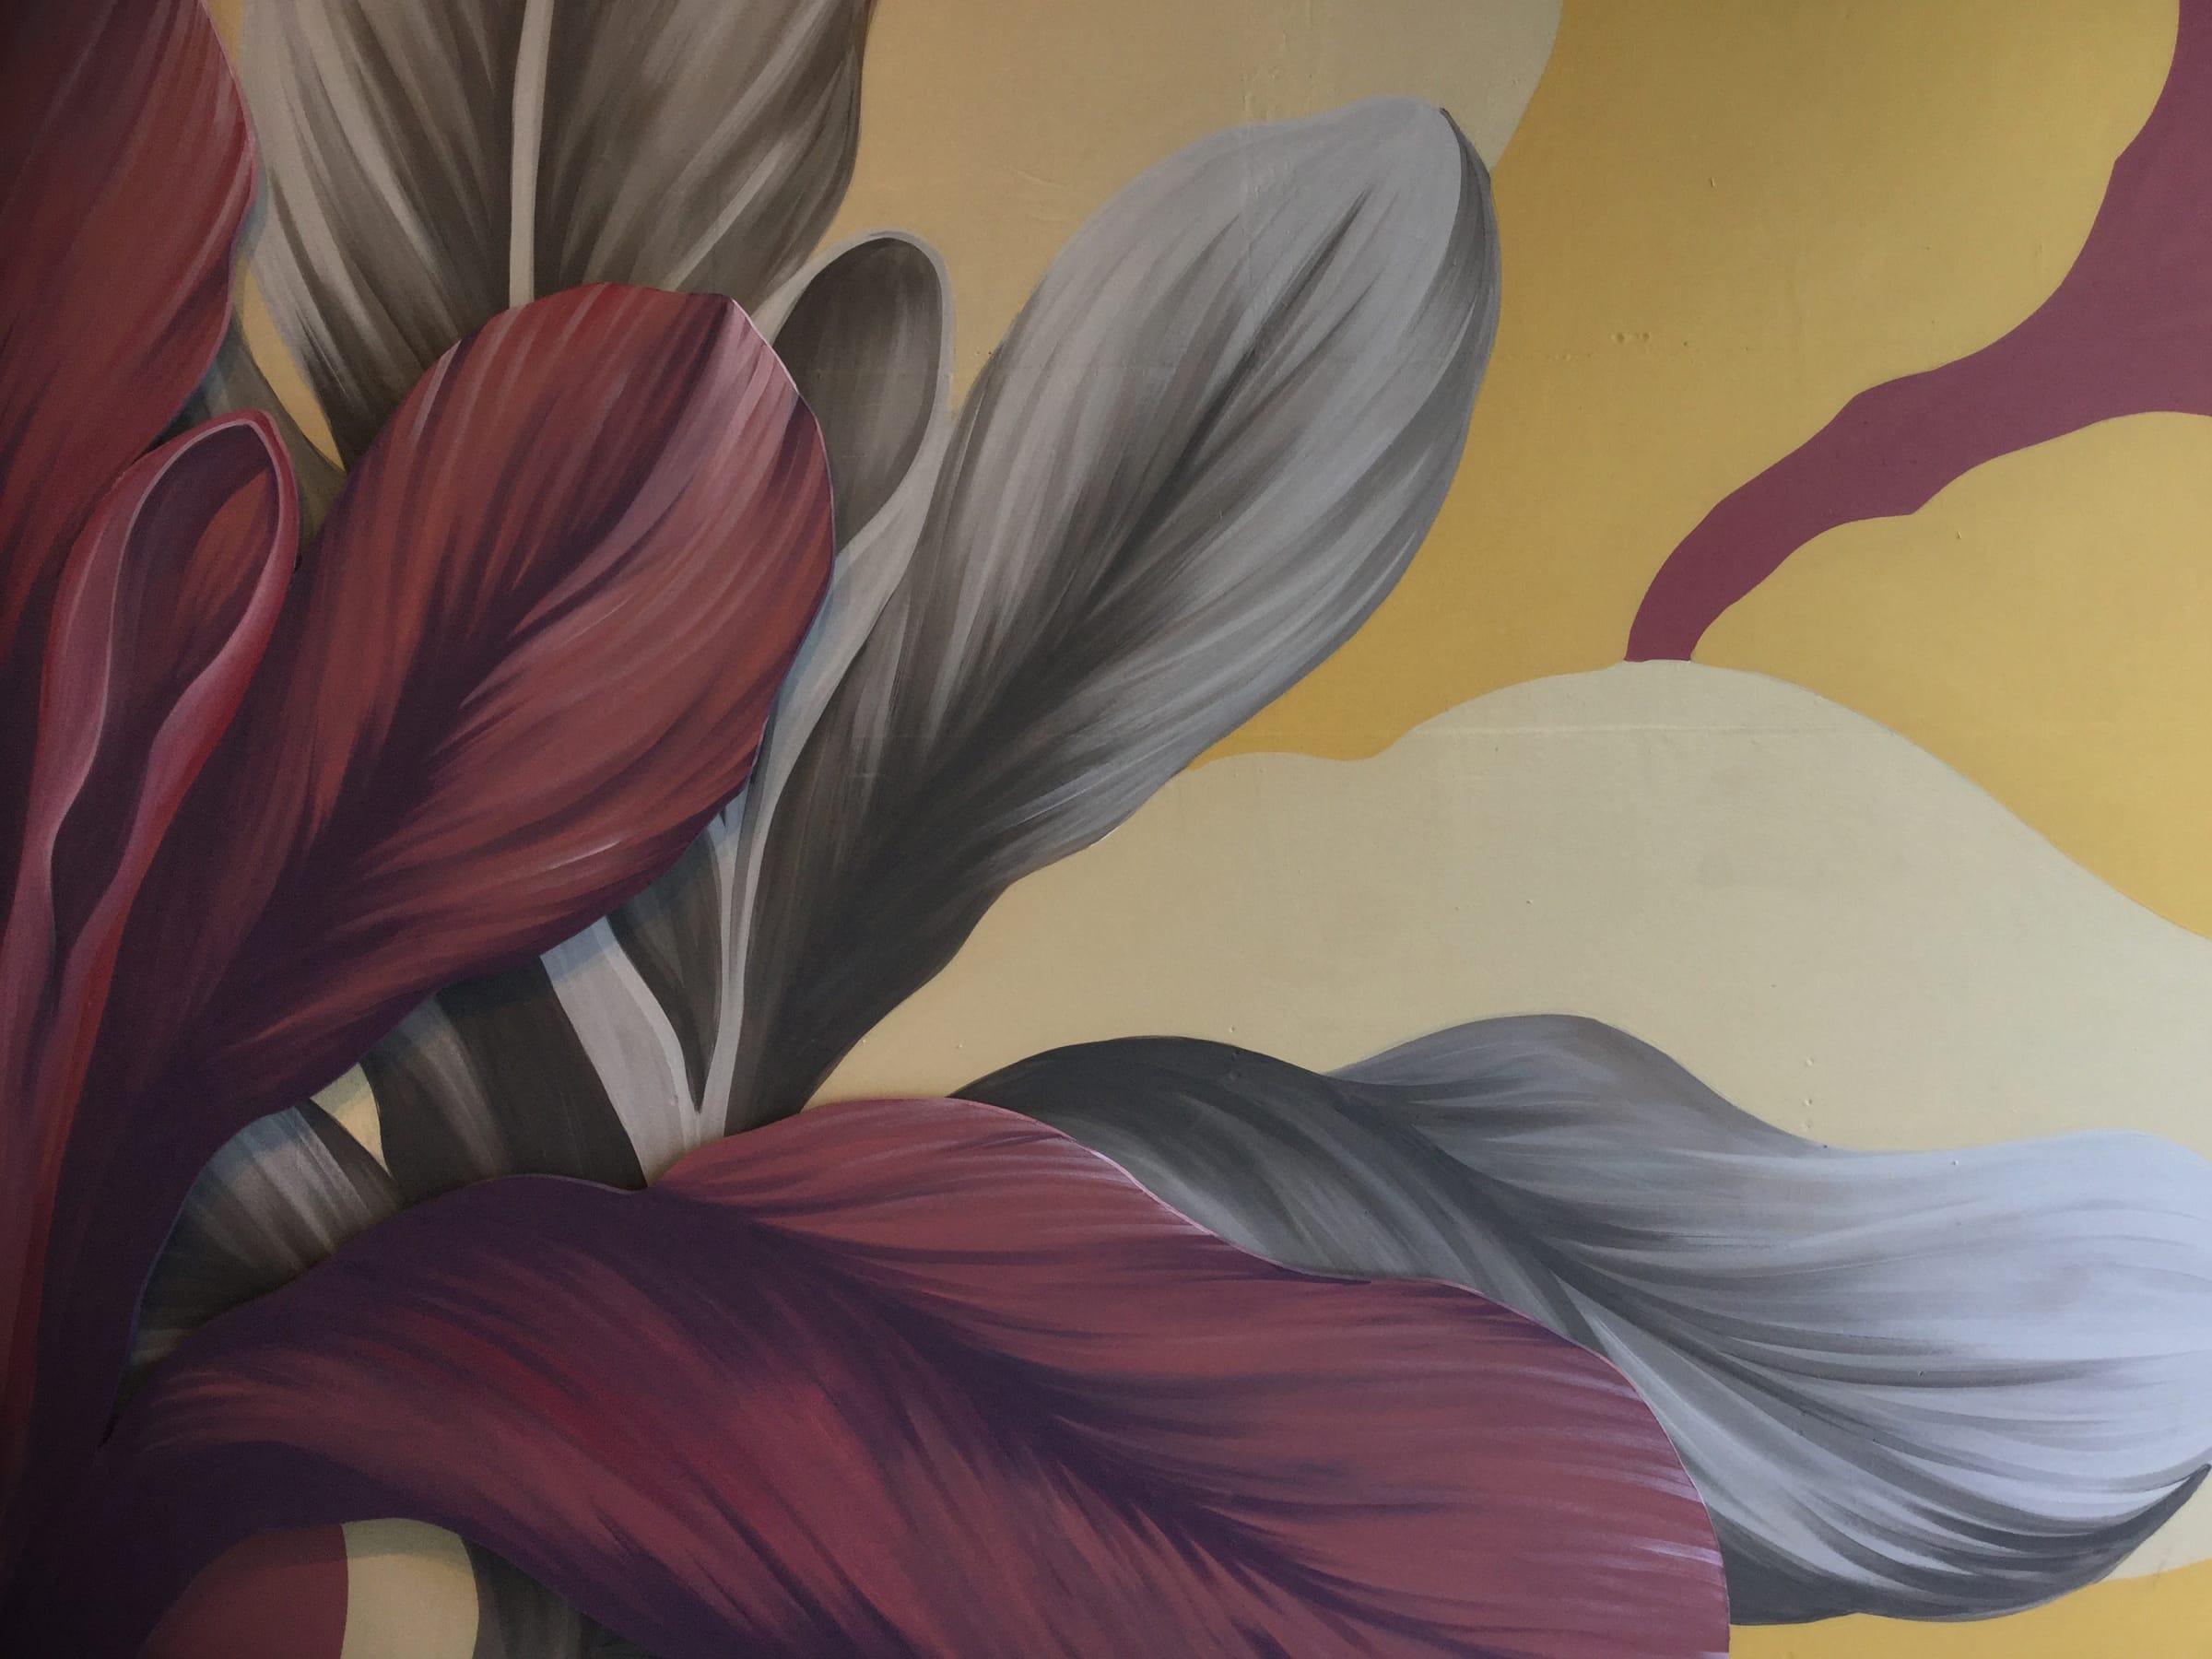 Murales de Flor Nativa